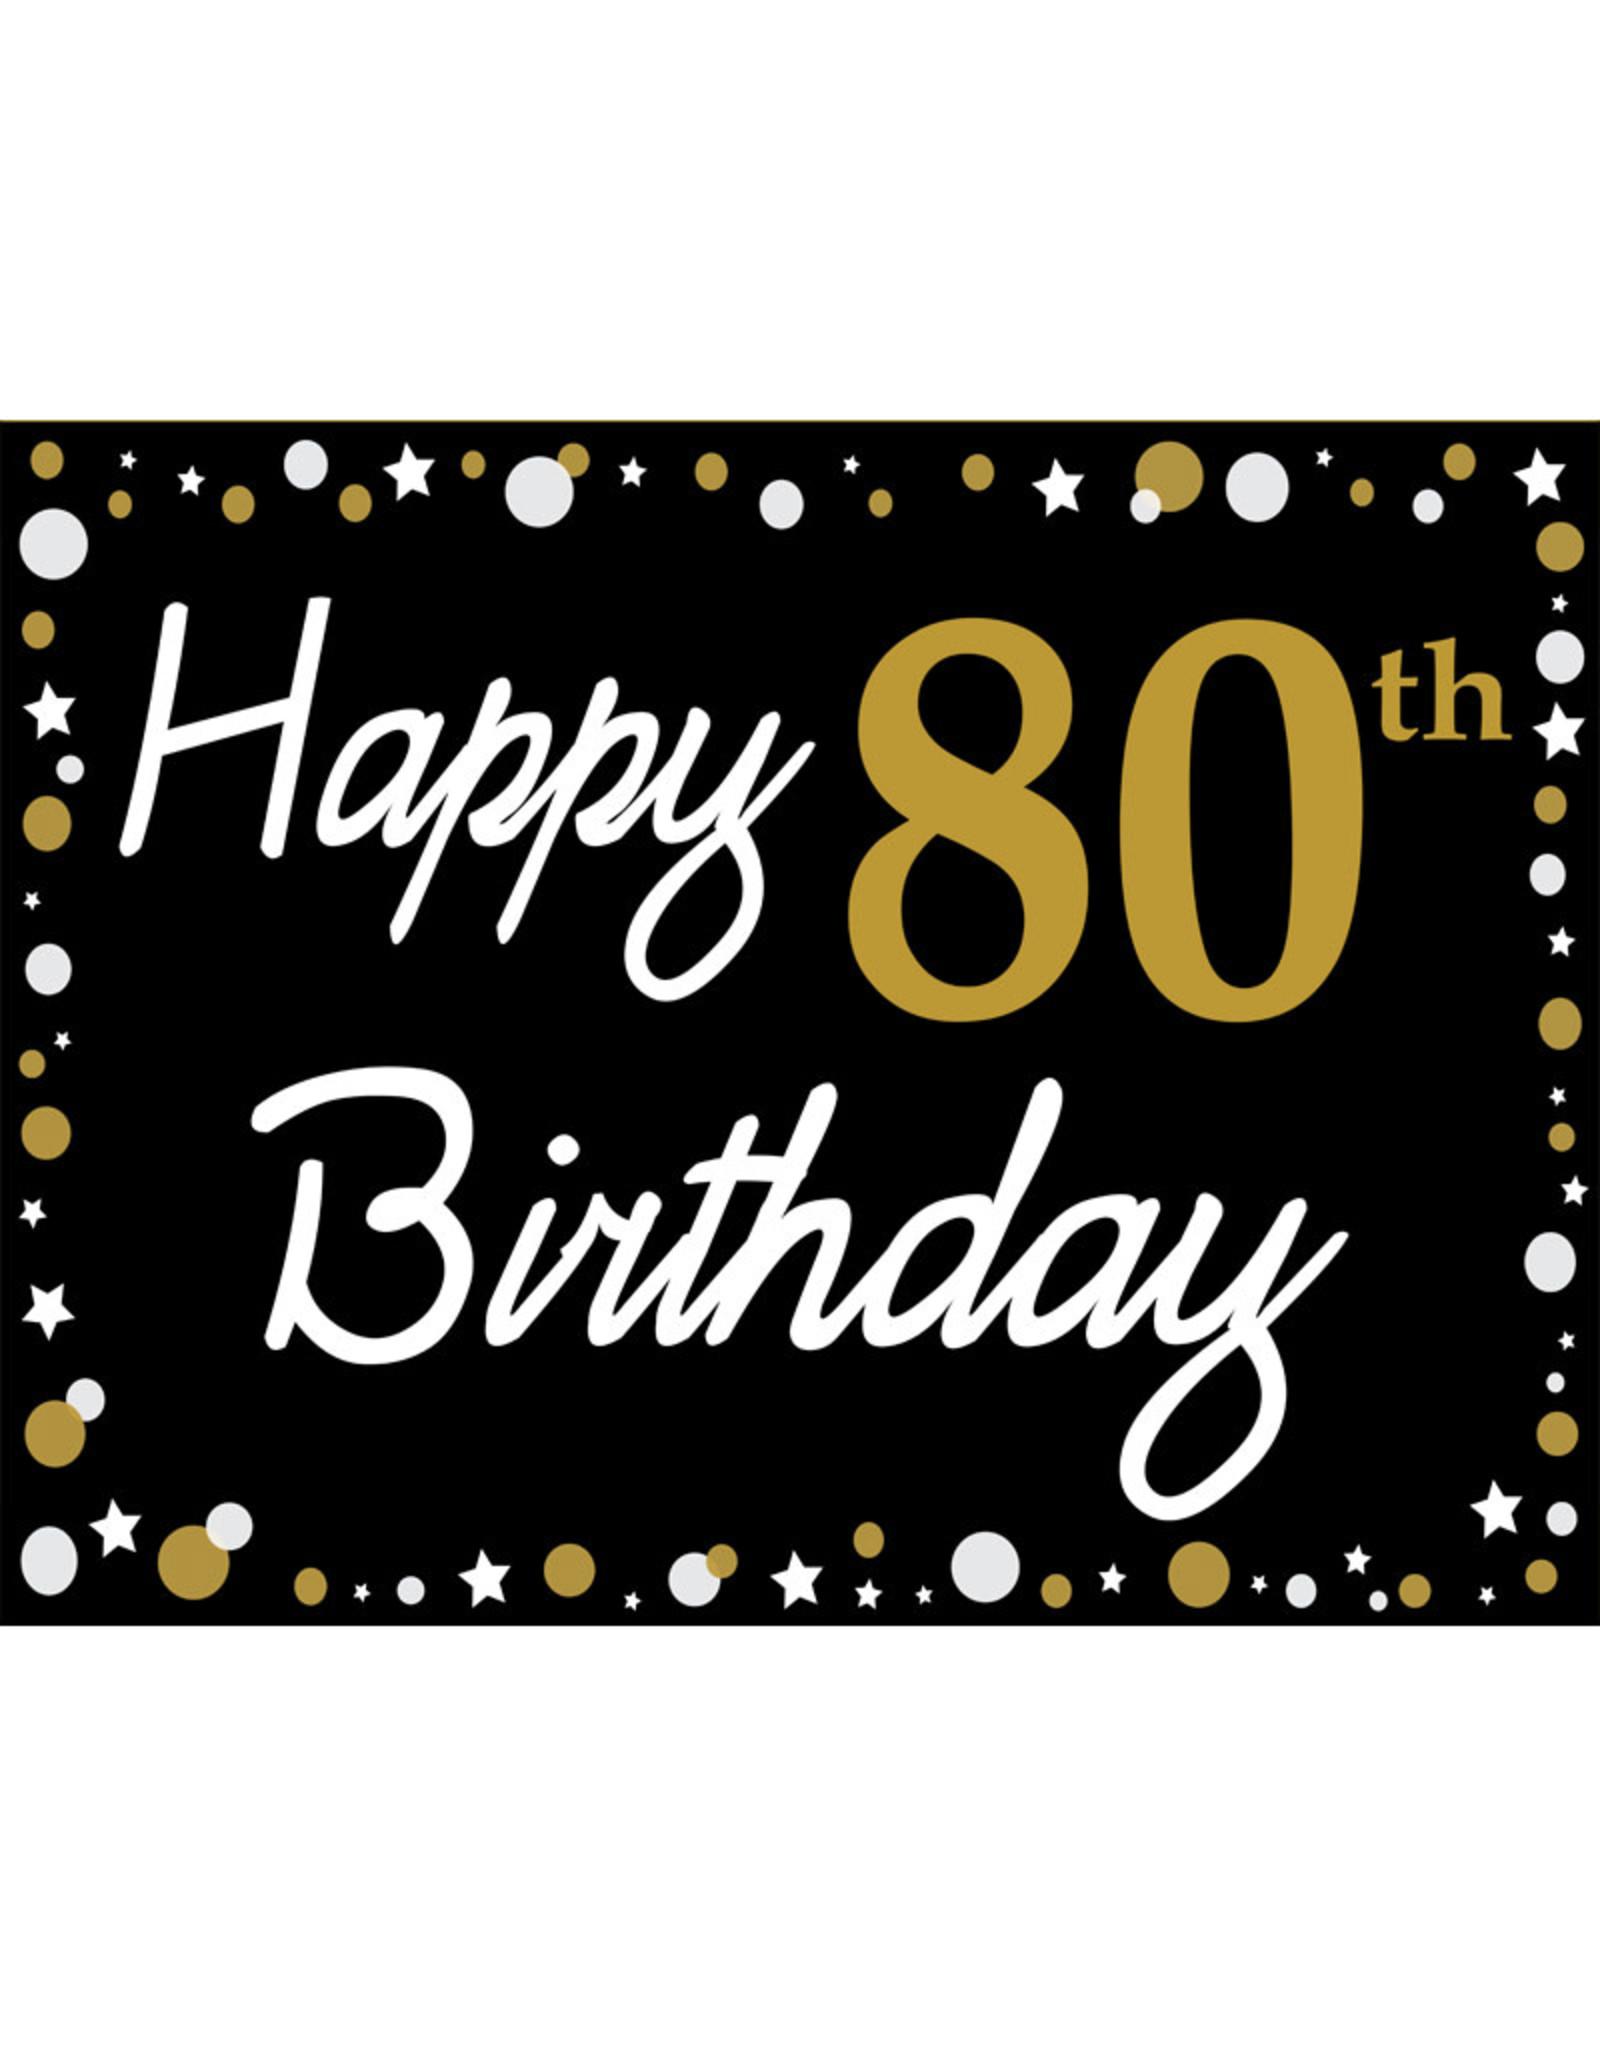 Happy 80th Birthday - Black, Gold & White Yard Sign